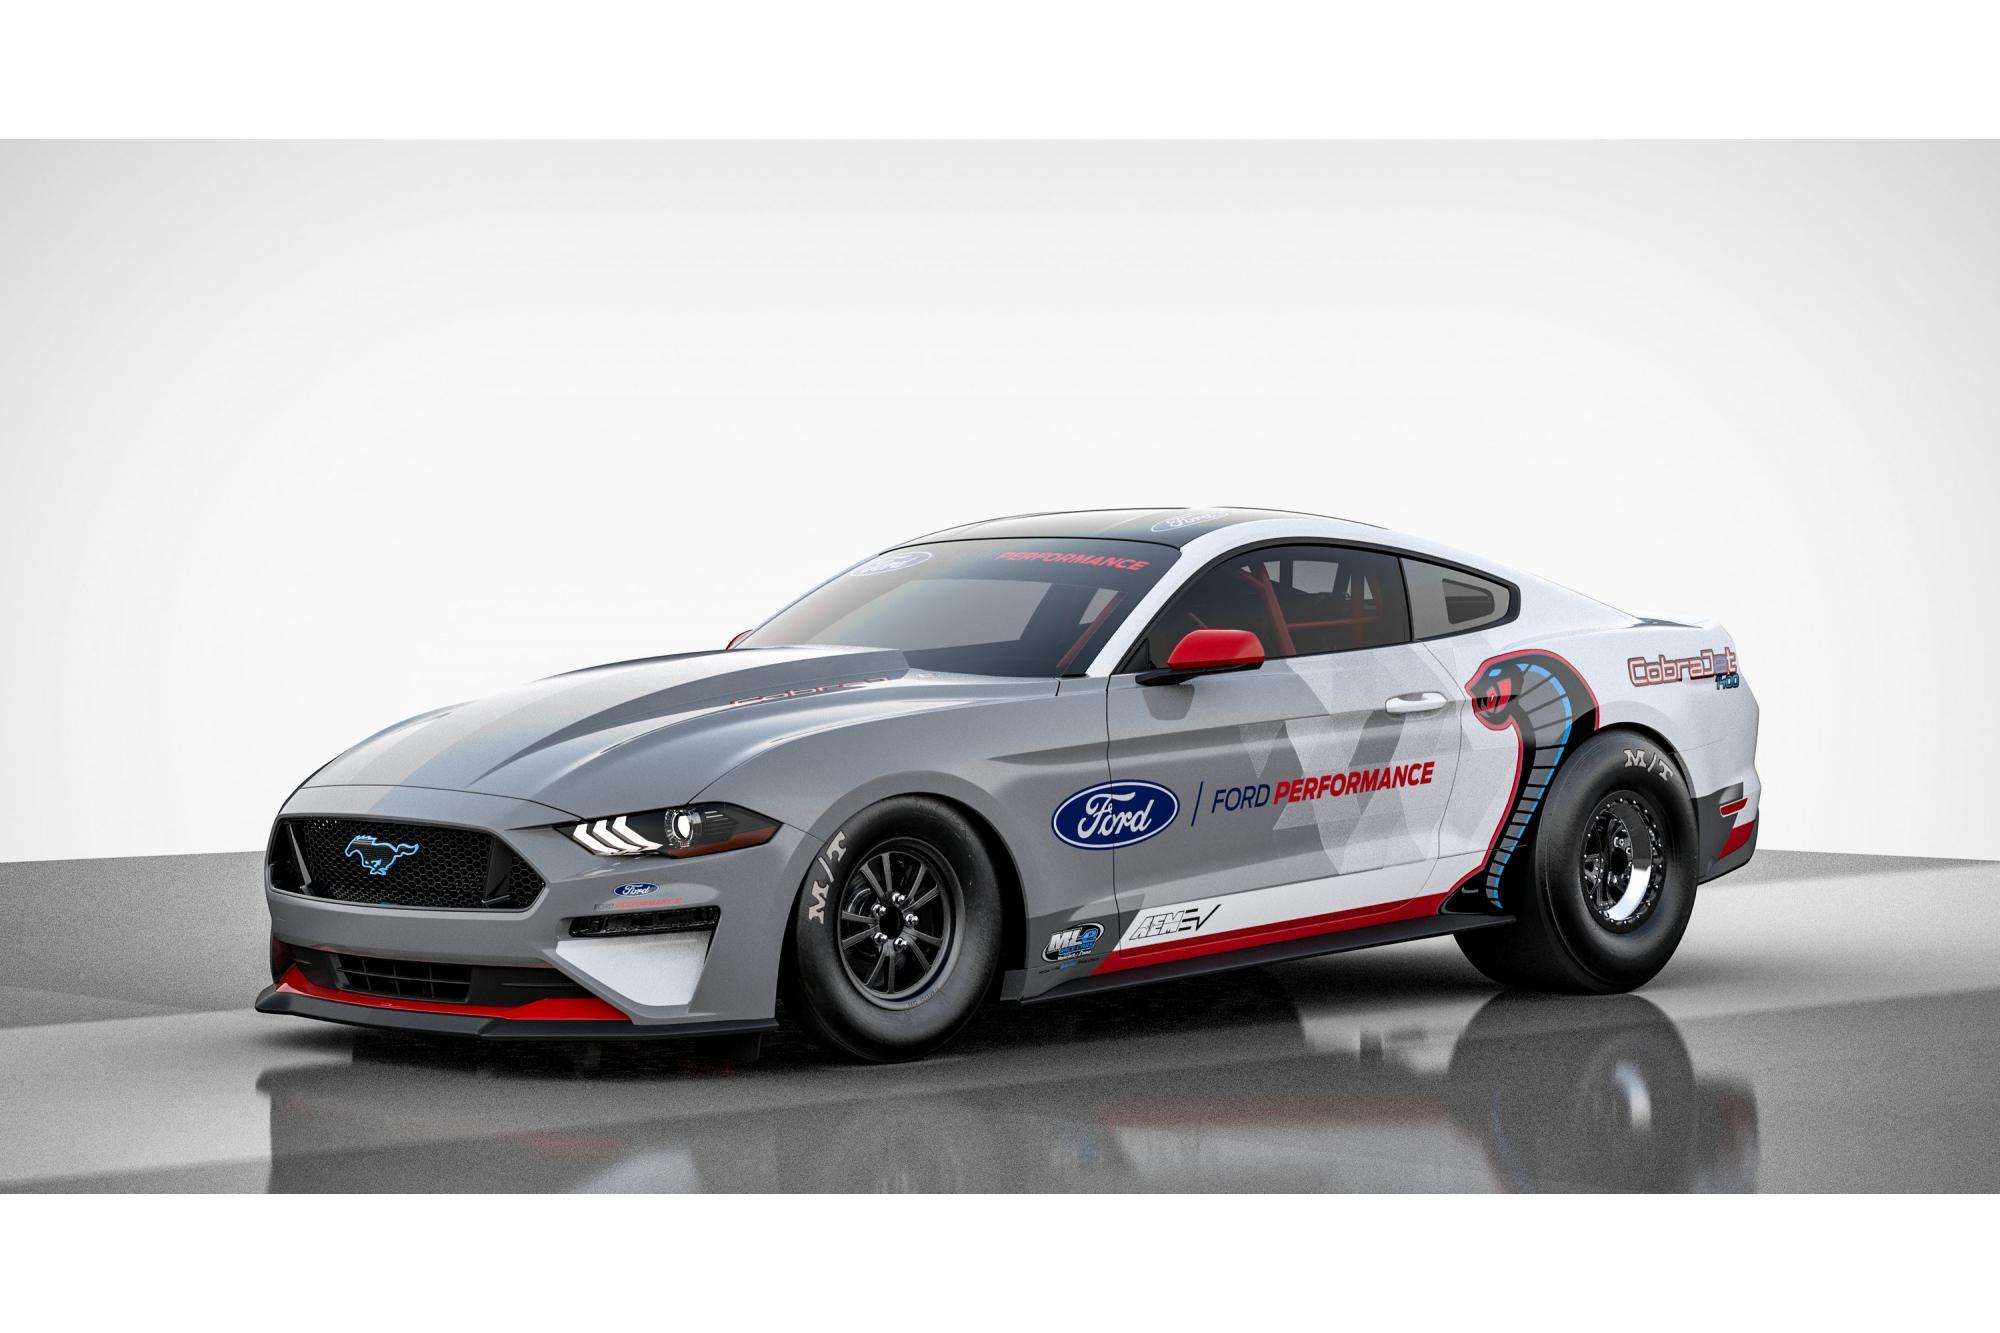 Ford Mustang  Cobra jet, έτοιμη για τα 400 μέτρα!